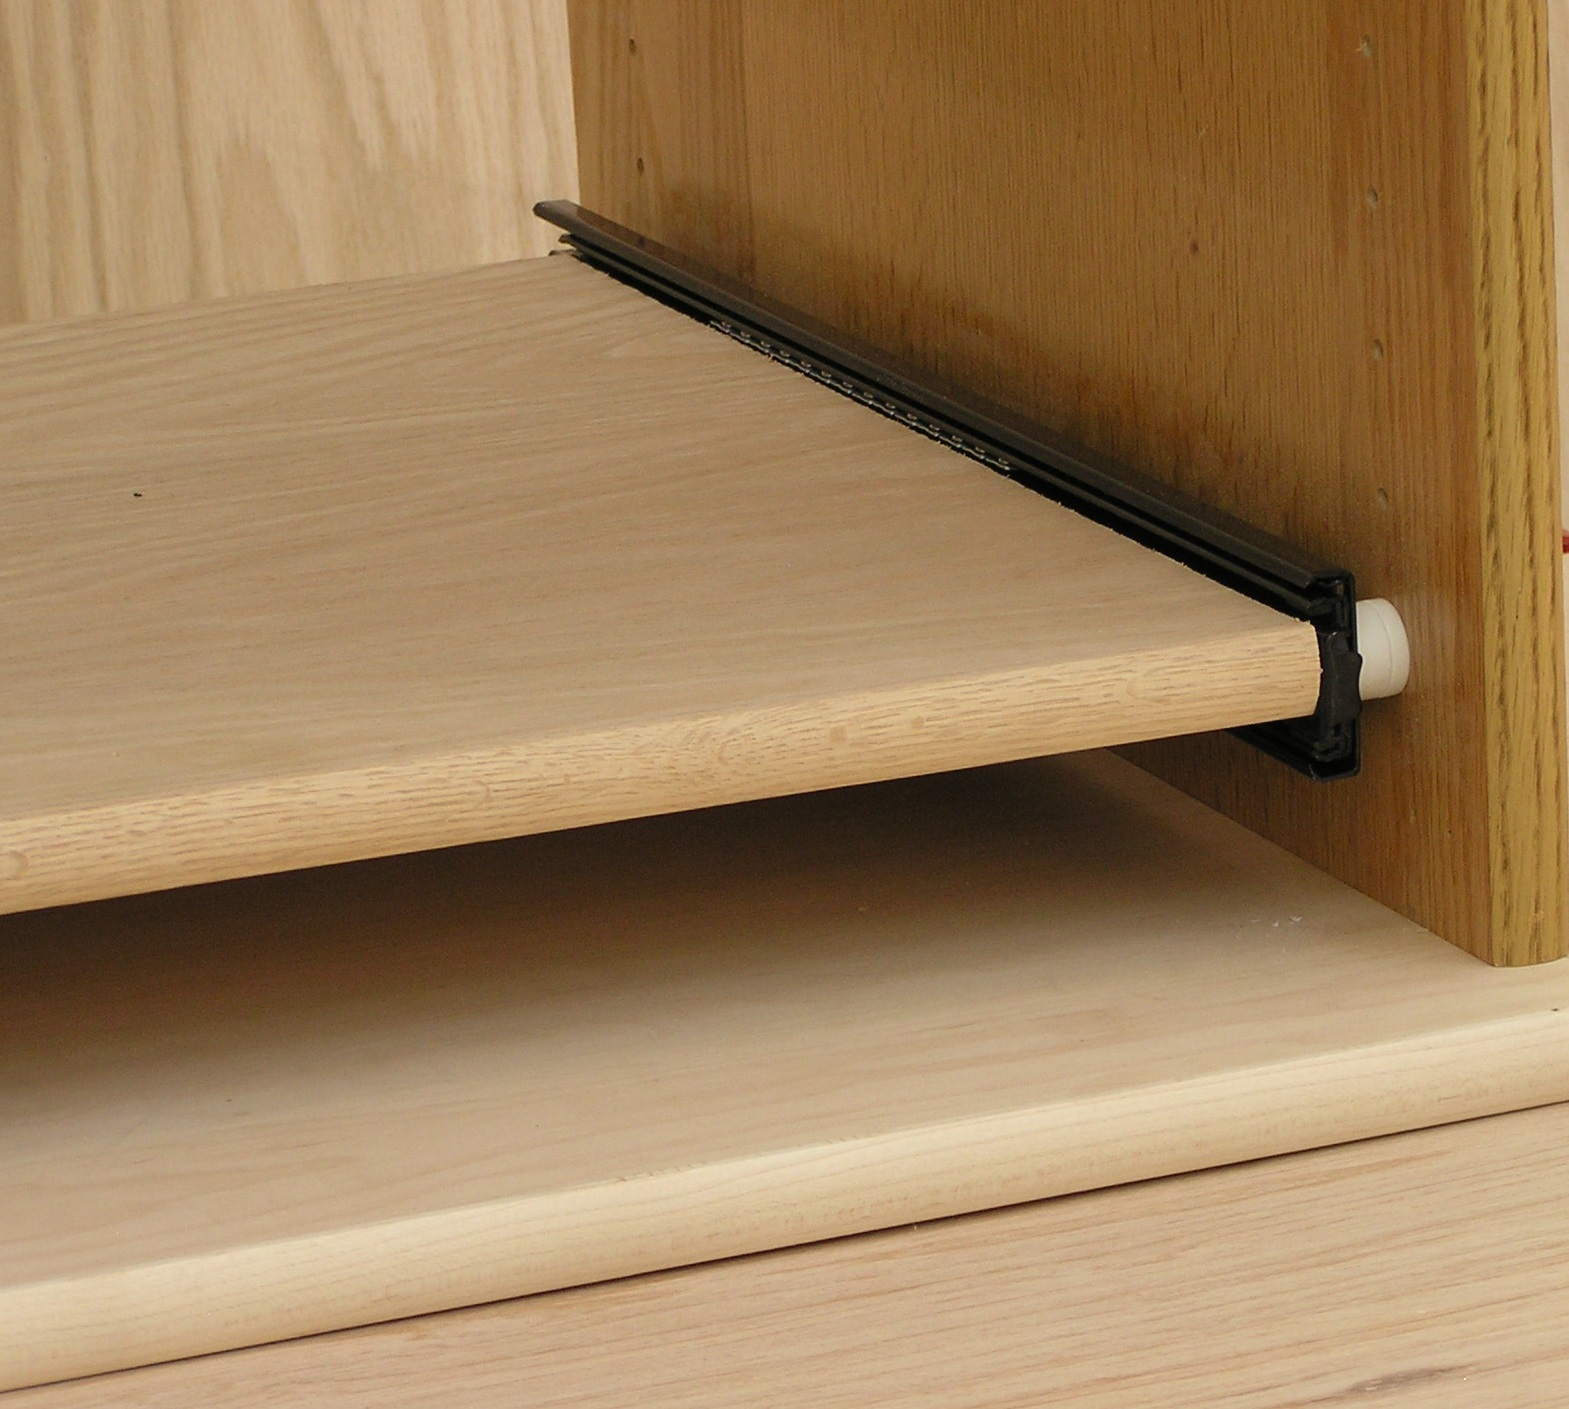 stand-off-slide-shelf-010.jpg